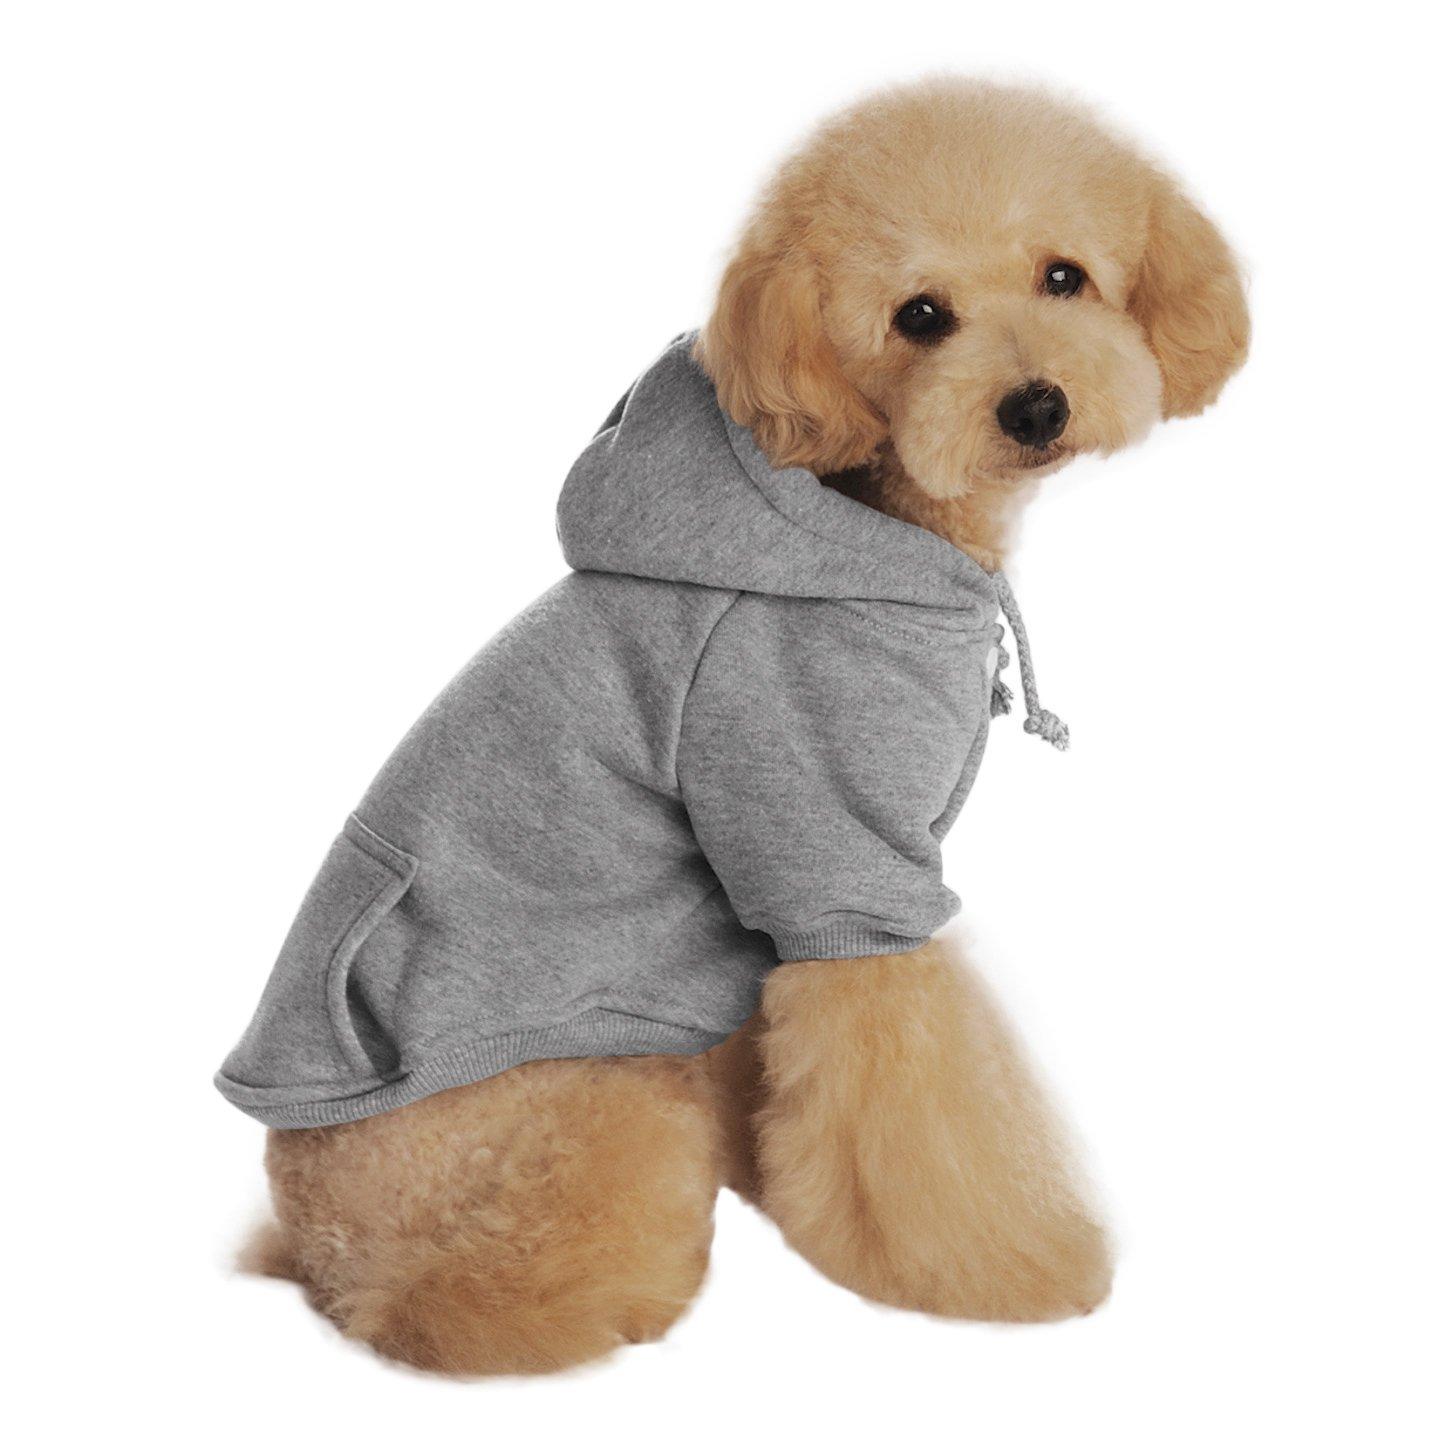 e1fec6a31 Get Quotations · Cute Cartoon Soft Warm Coral Fleece Pet Hoodie Coat Jacket  Winter Autumn No Cold Thick Velvet